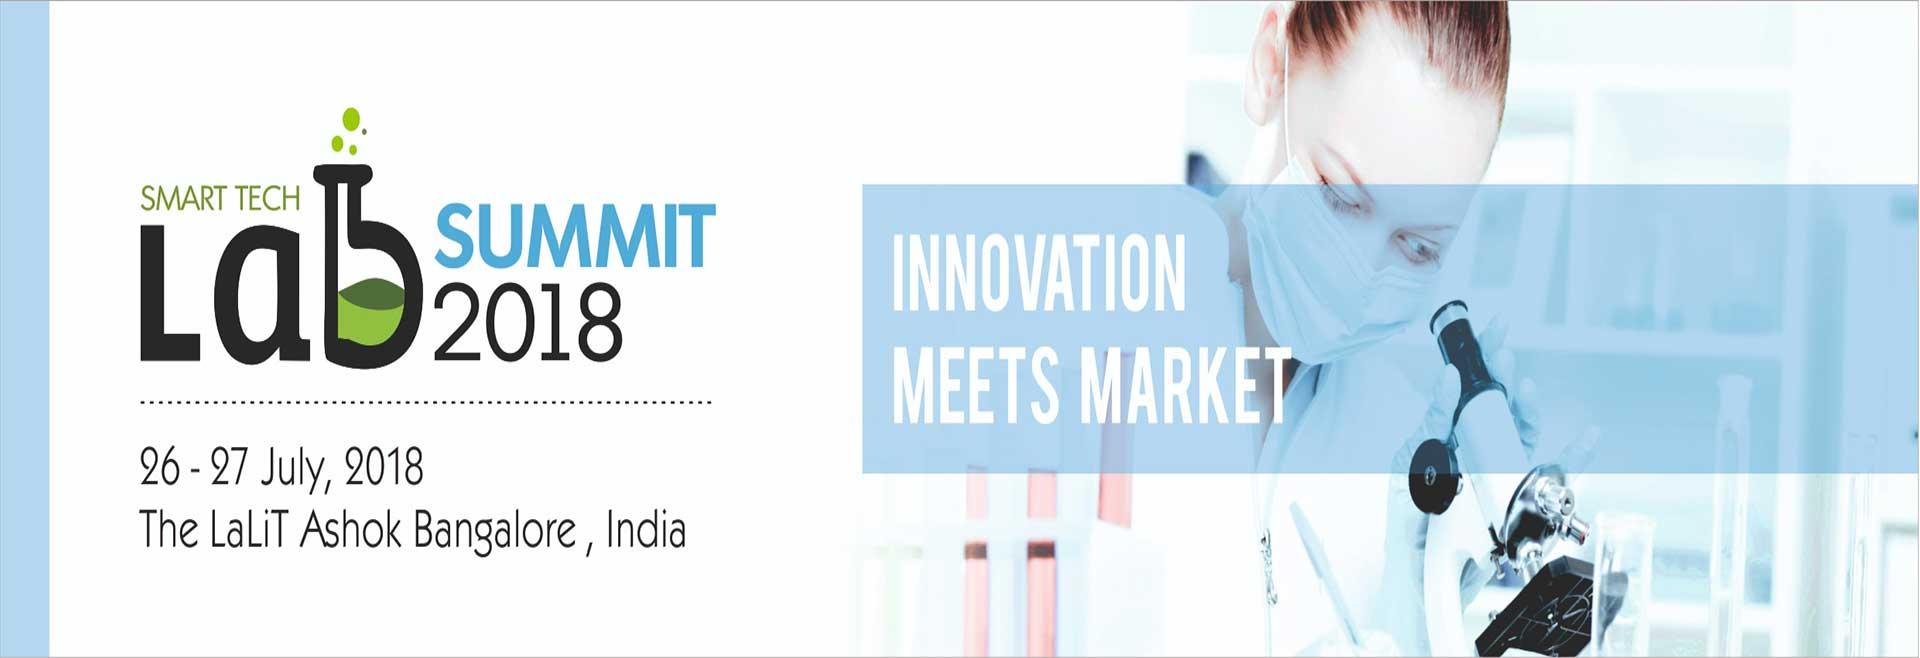 Smart Tech Lab Summit